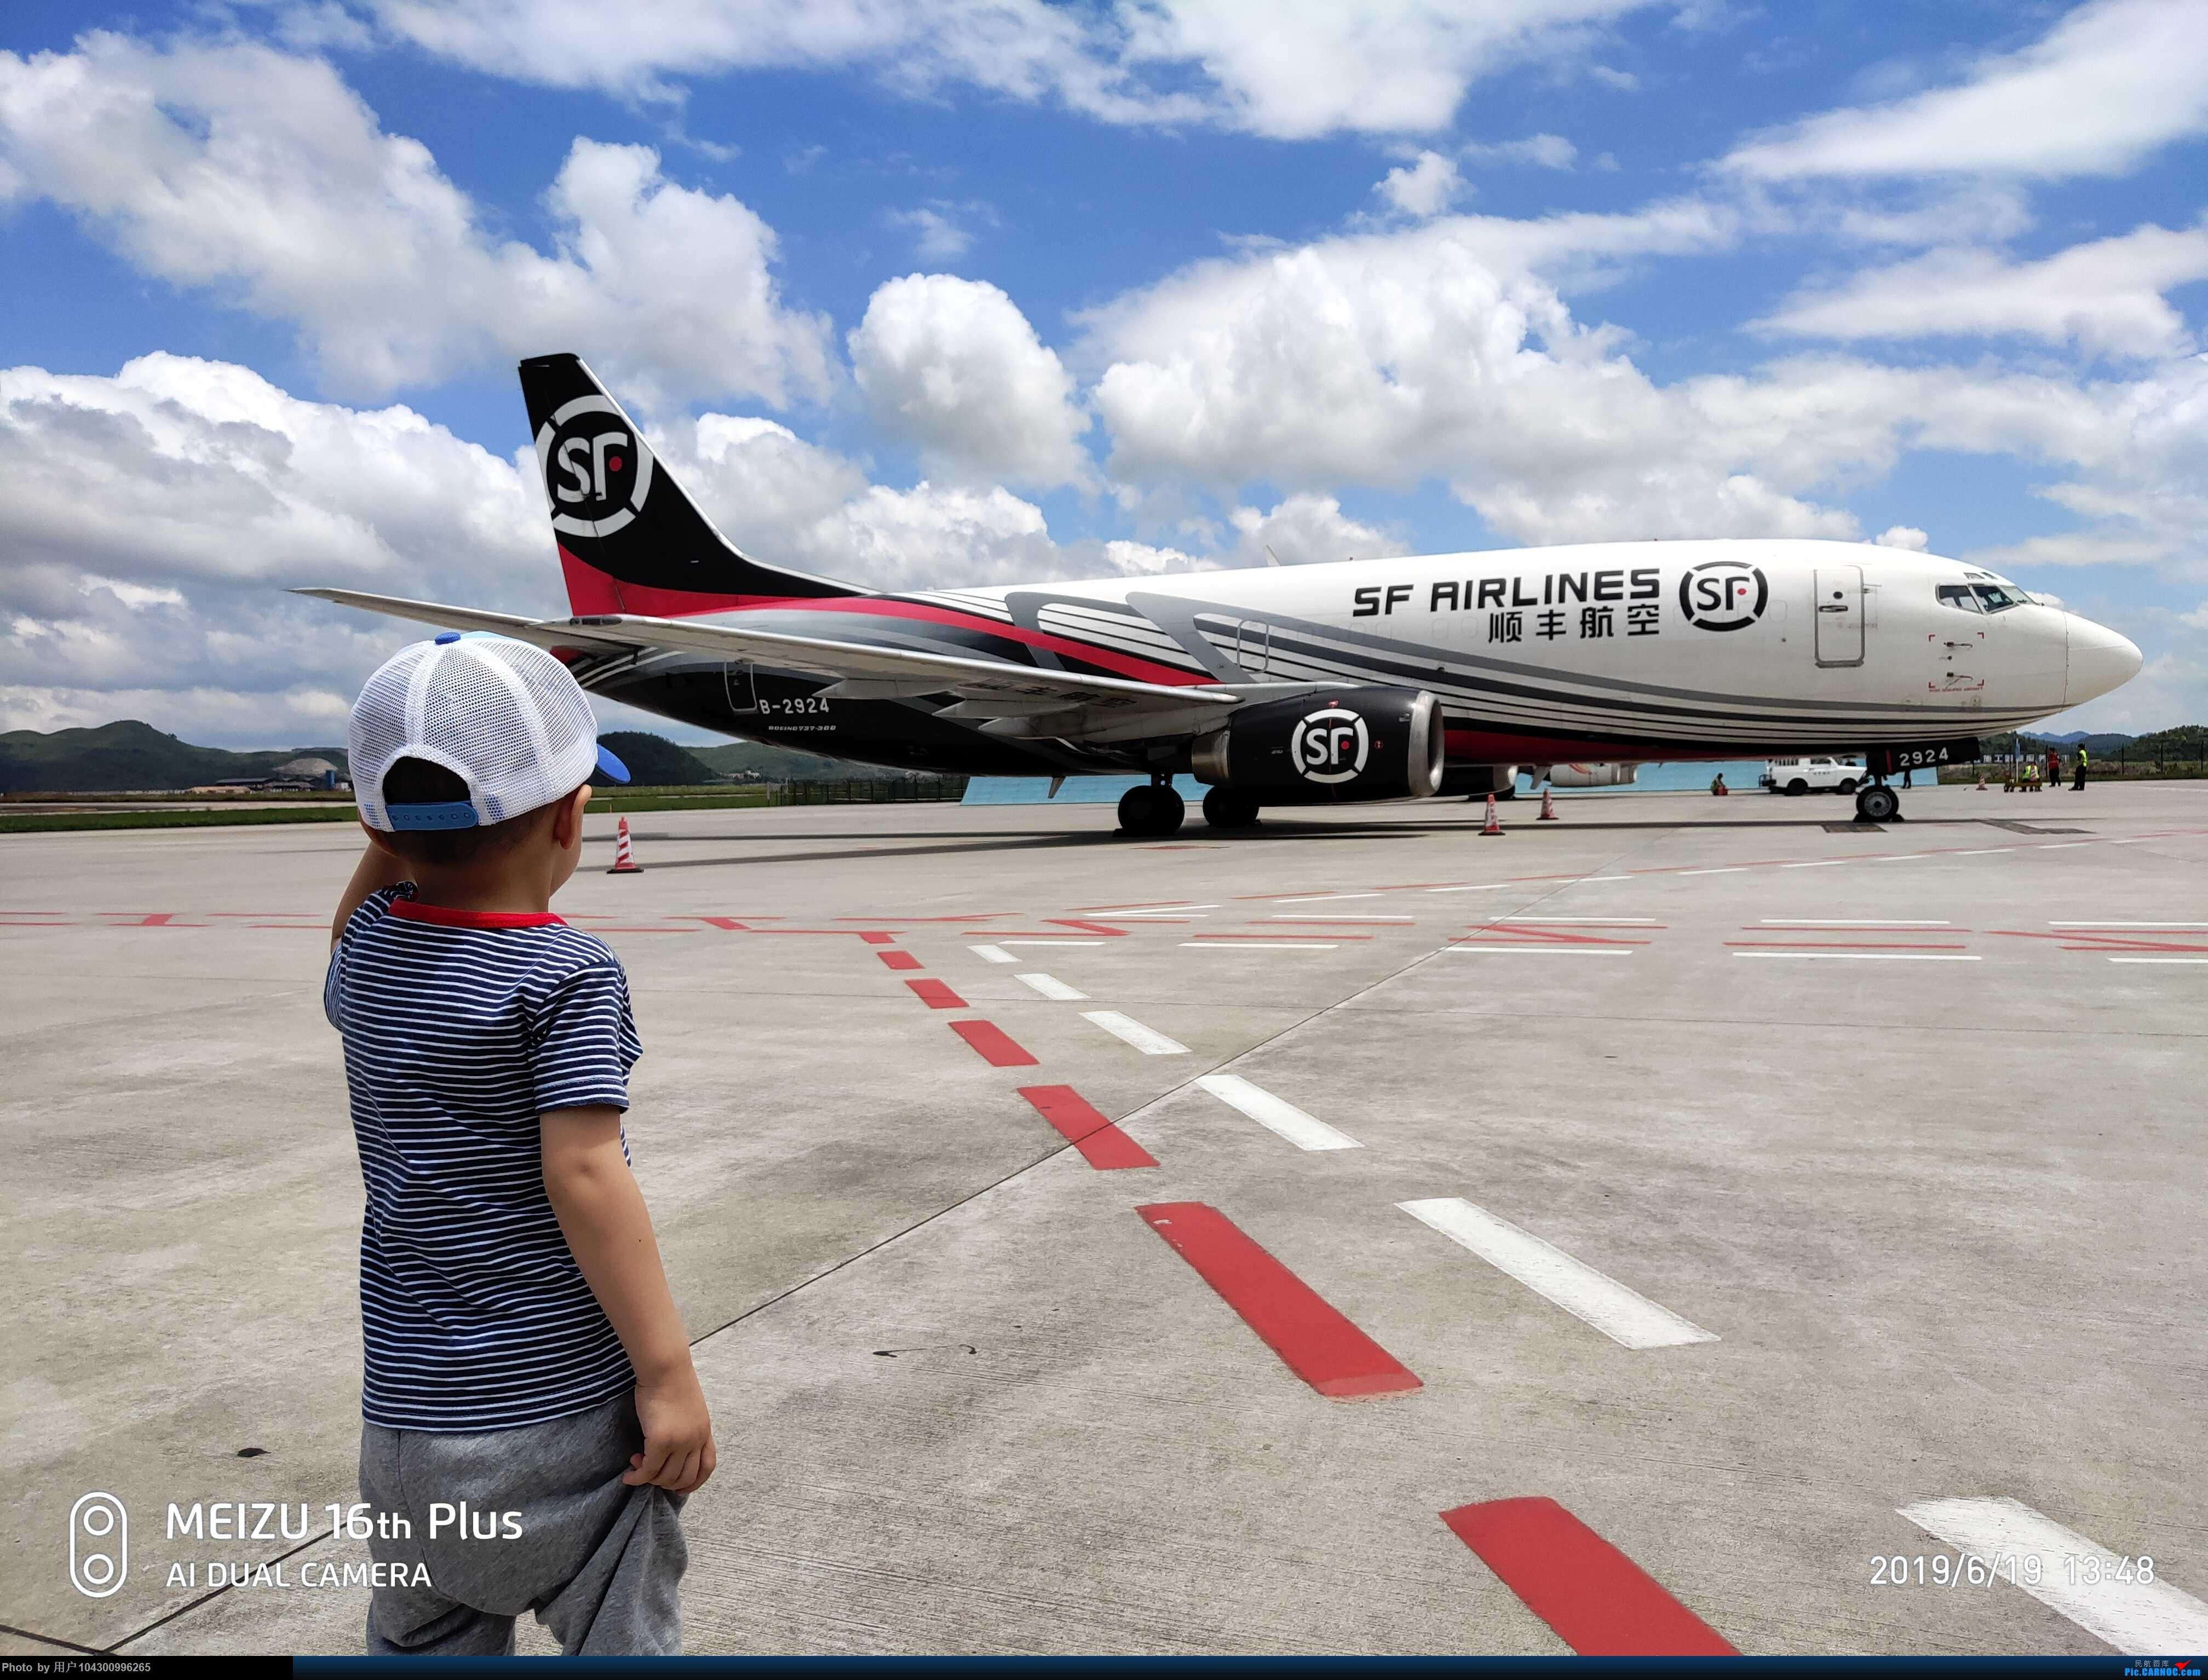 Re:[原创]DM哥飞行游记--贵阳往返荔波2日游 BOEING 737-300 B-2924 中国贵阳龙洞堡国际机场